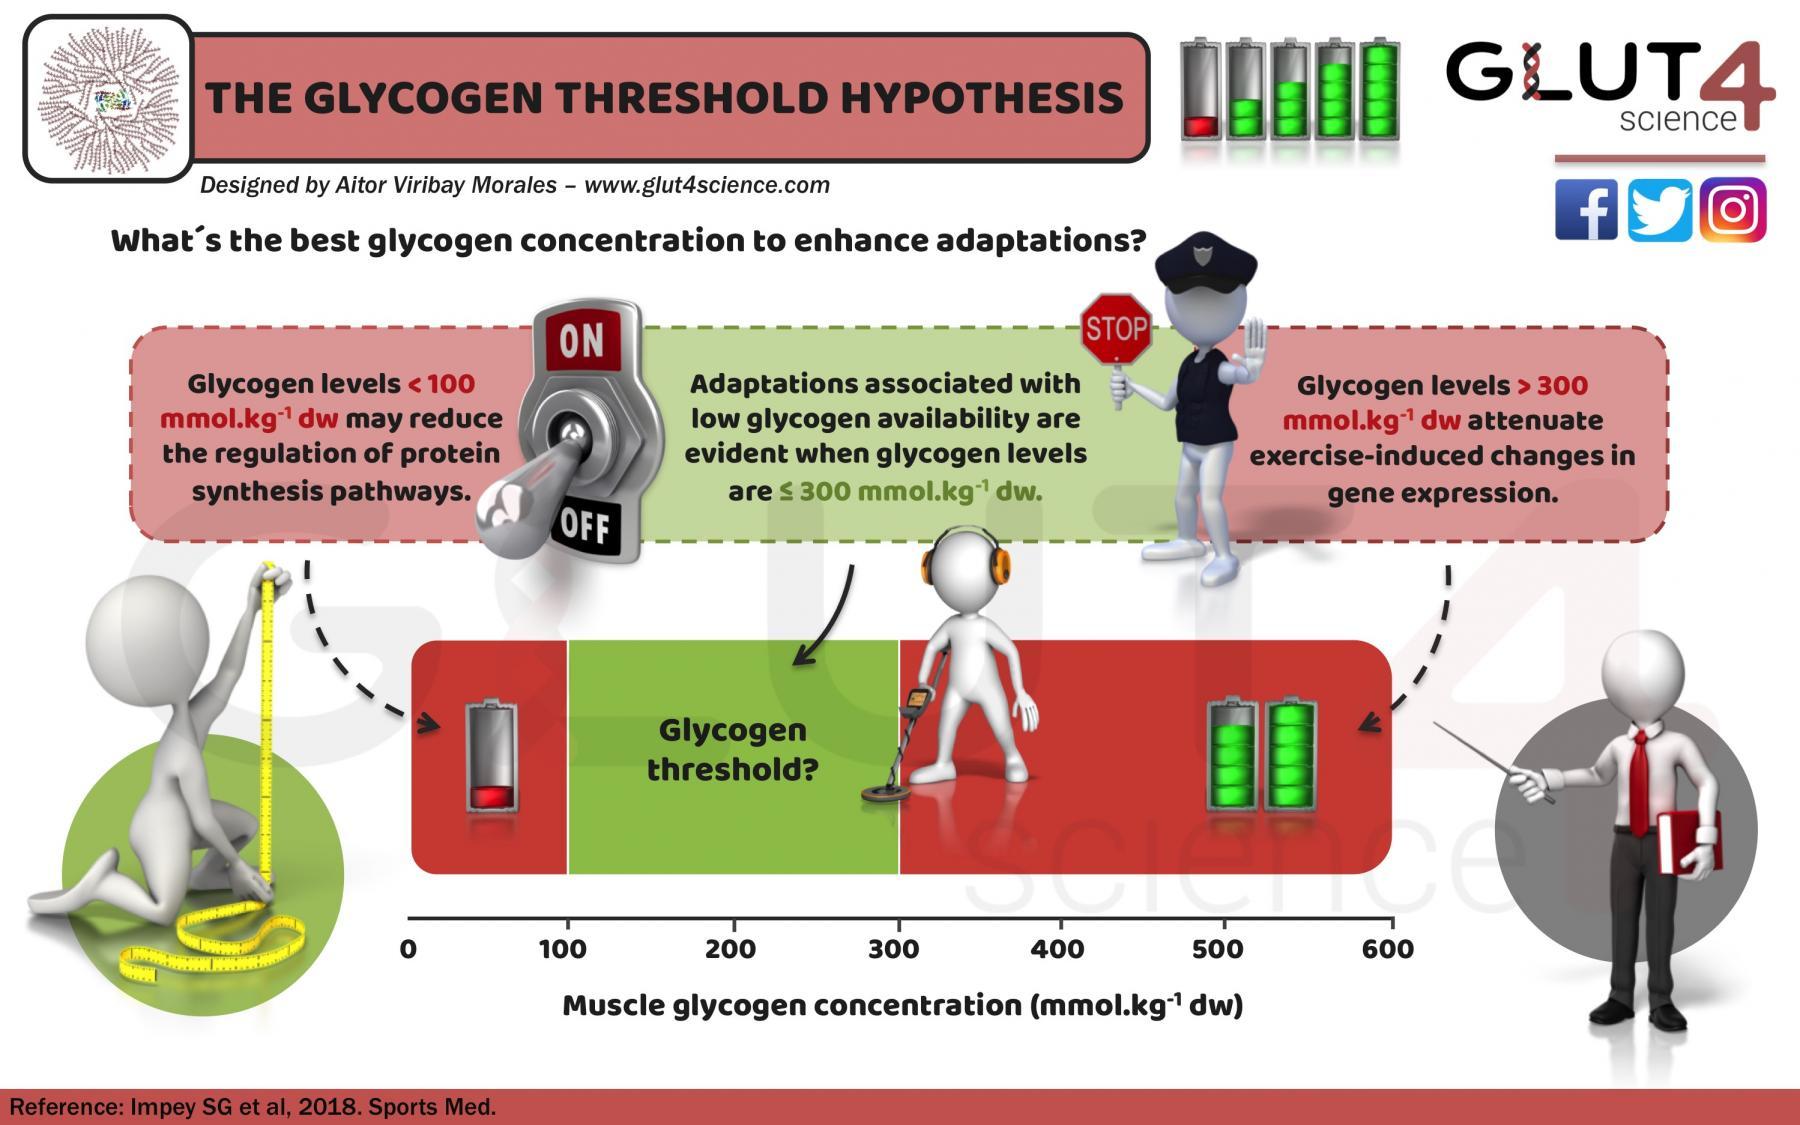 Glycogen Threshold Hypothesis